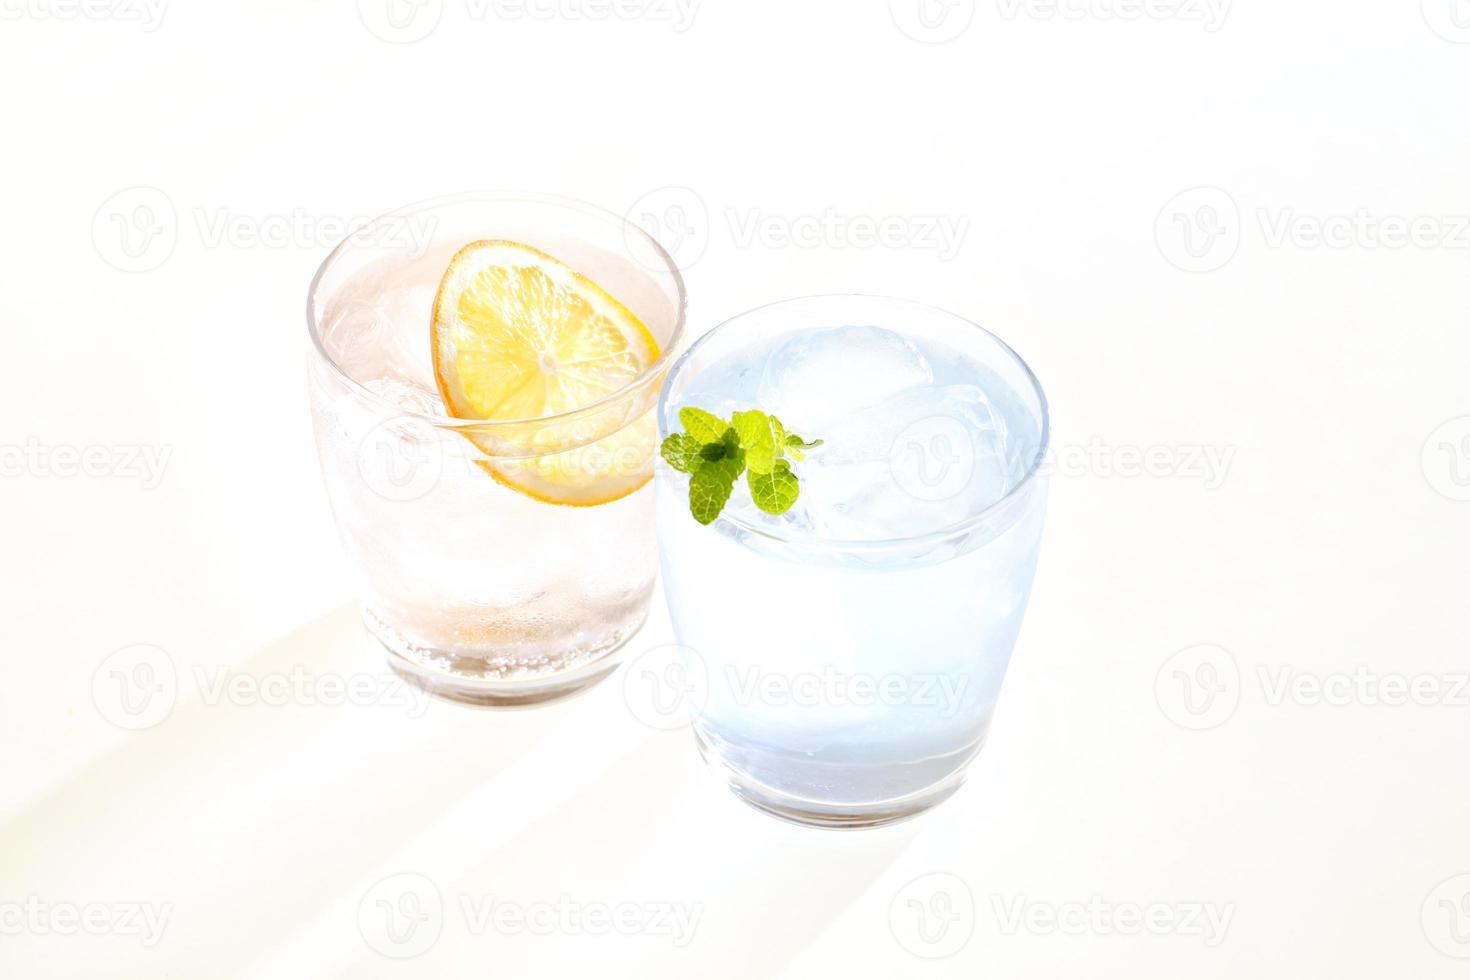 alkoholhaltiga drycker foto